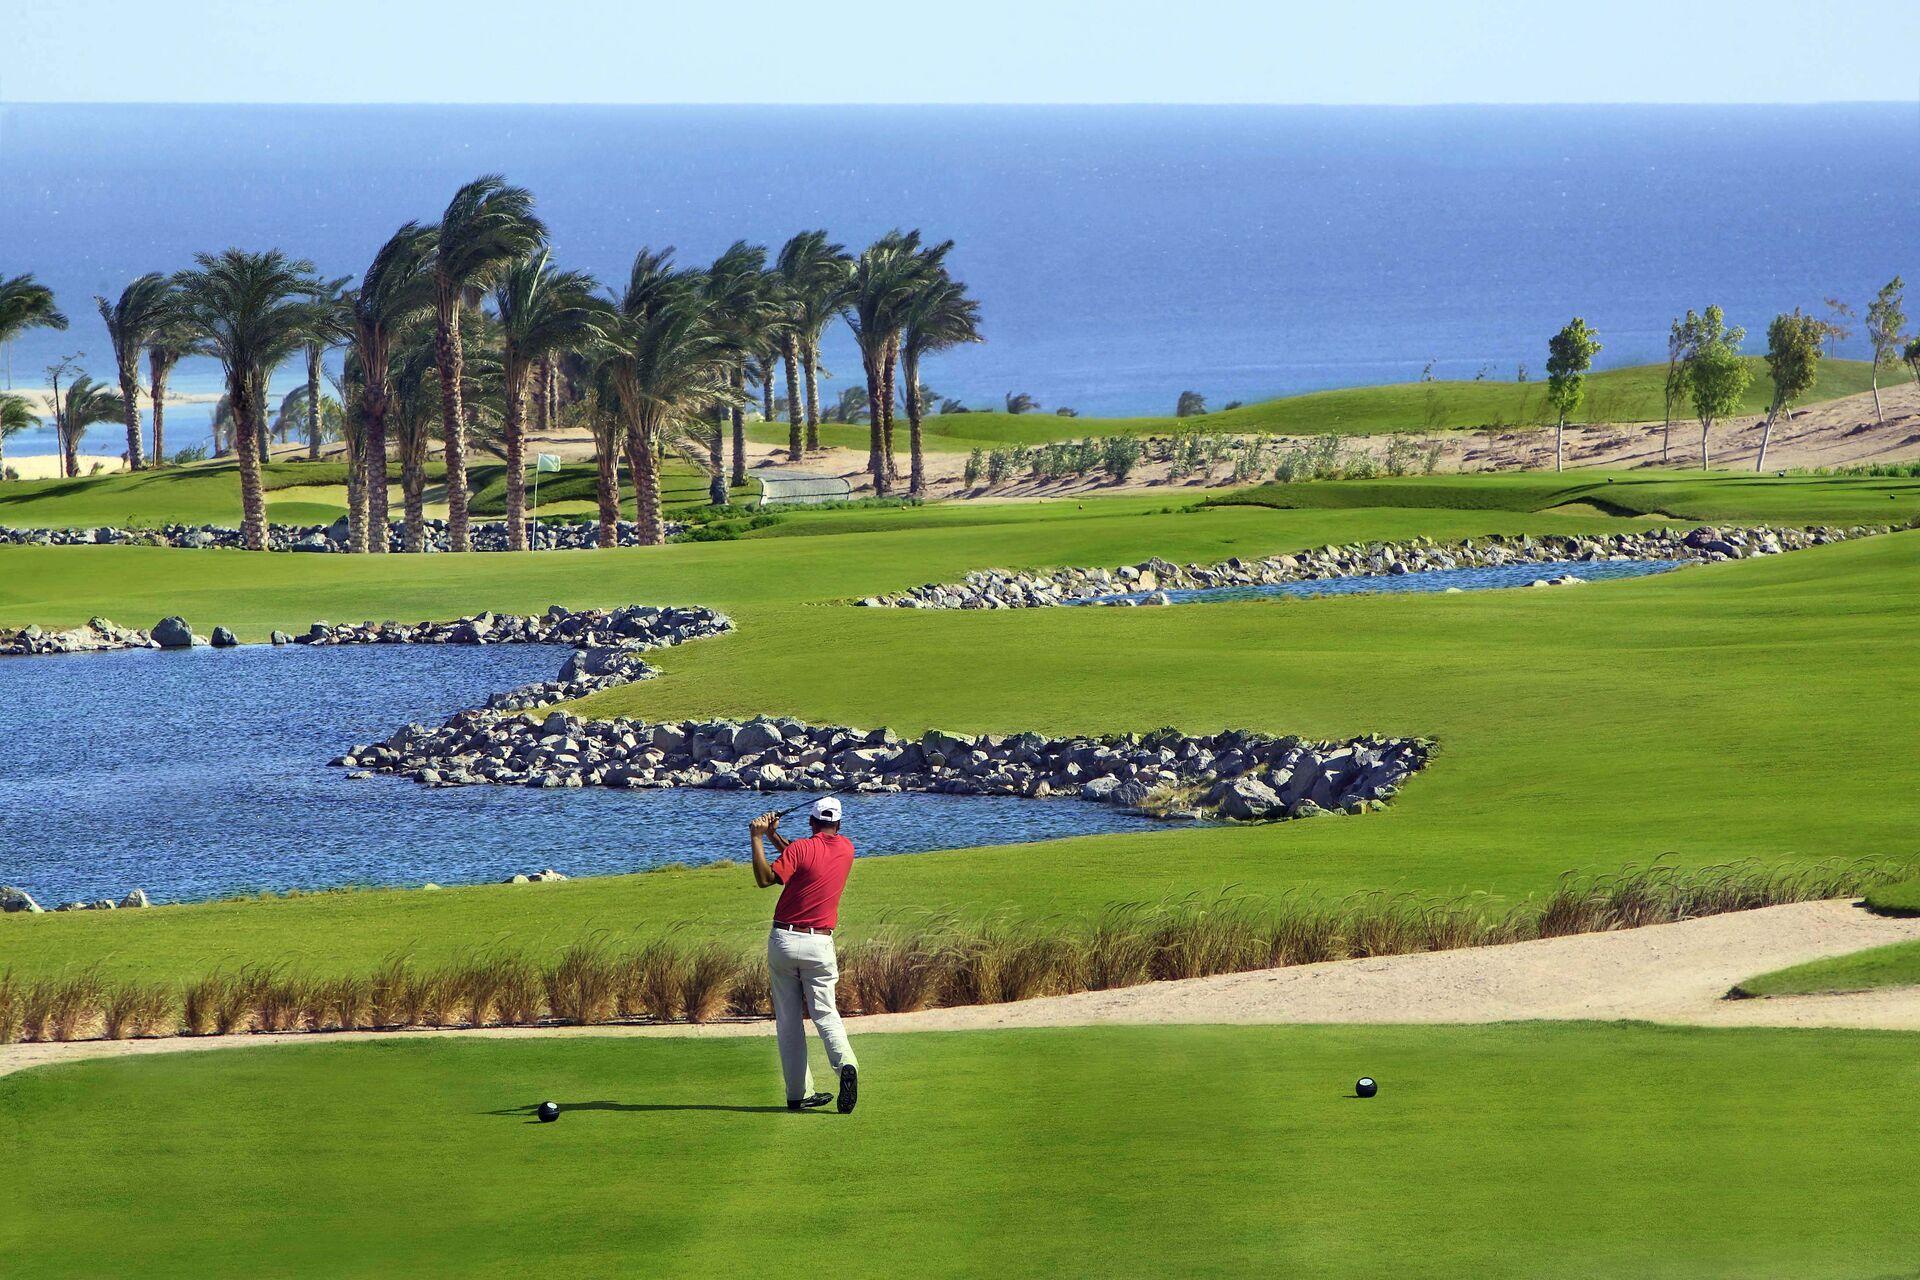 https://cms.satur.sk/data/imgs/tour_image/orig/golf-court-2-1947532.jpg